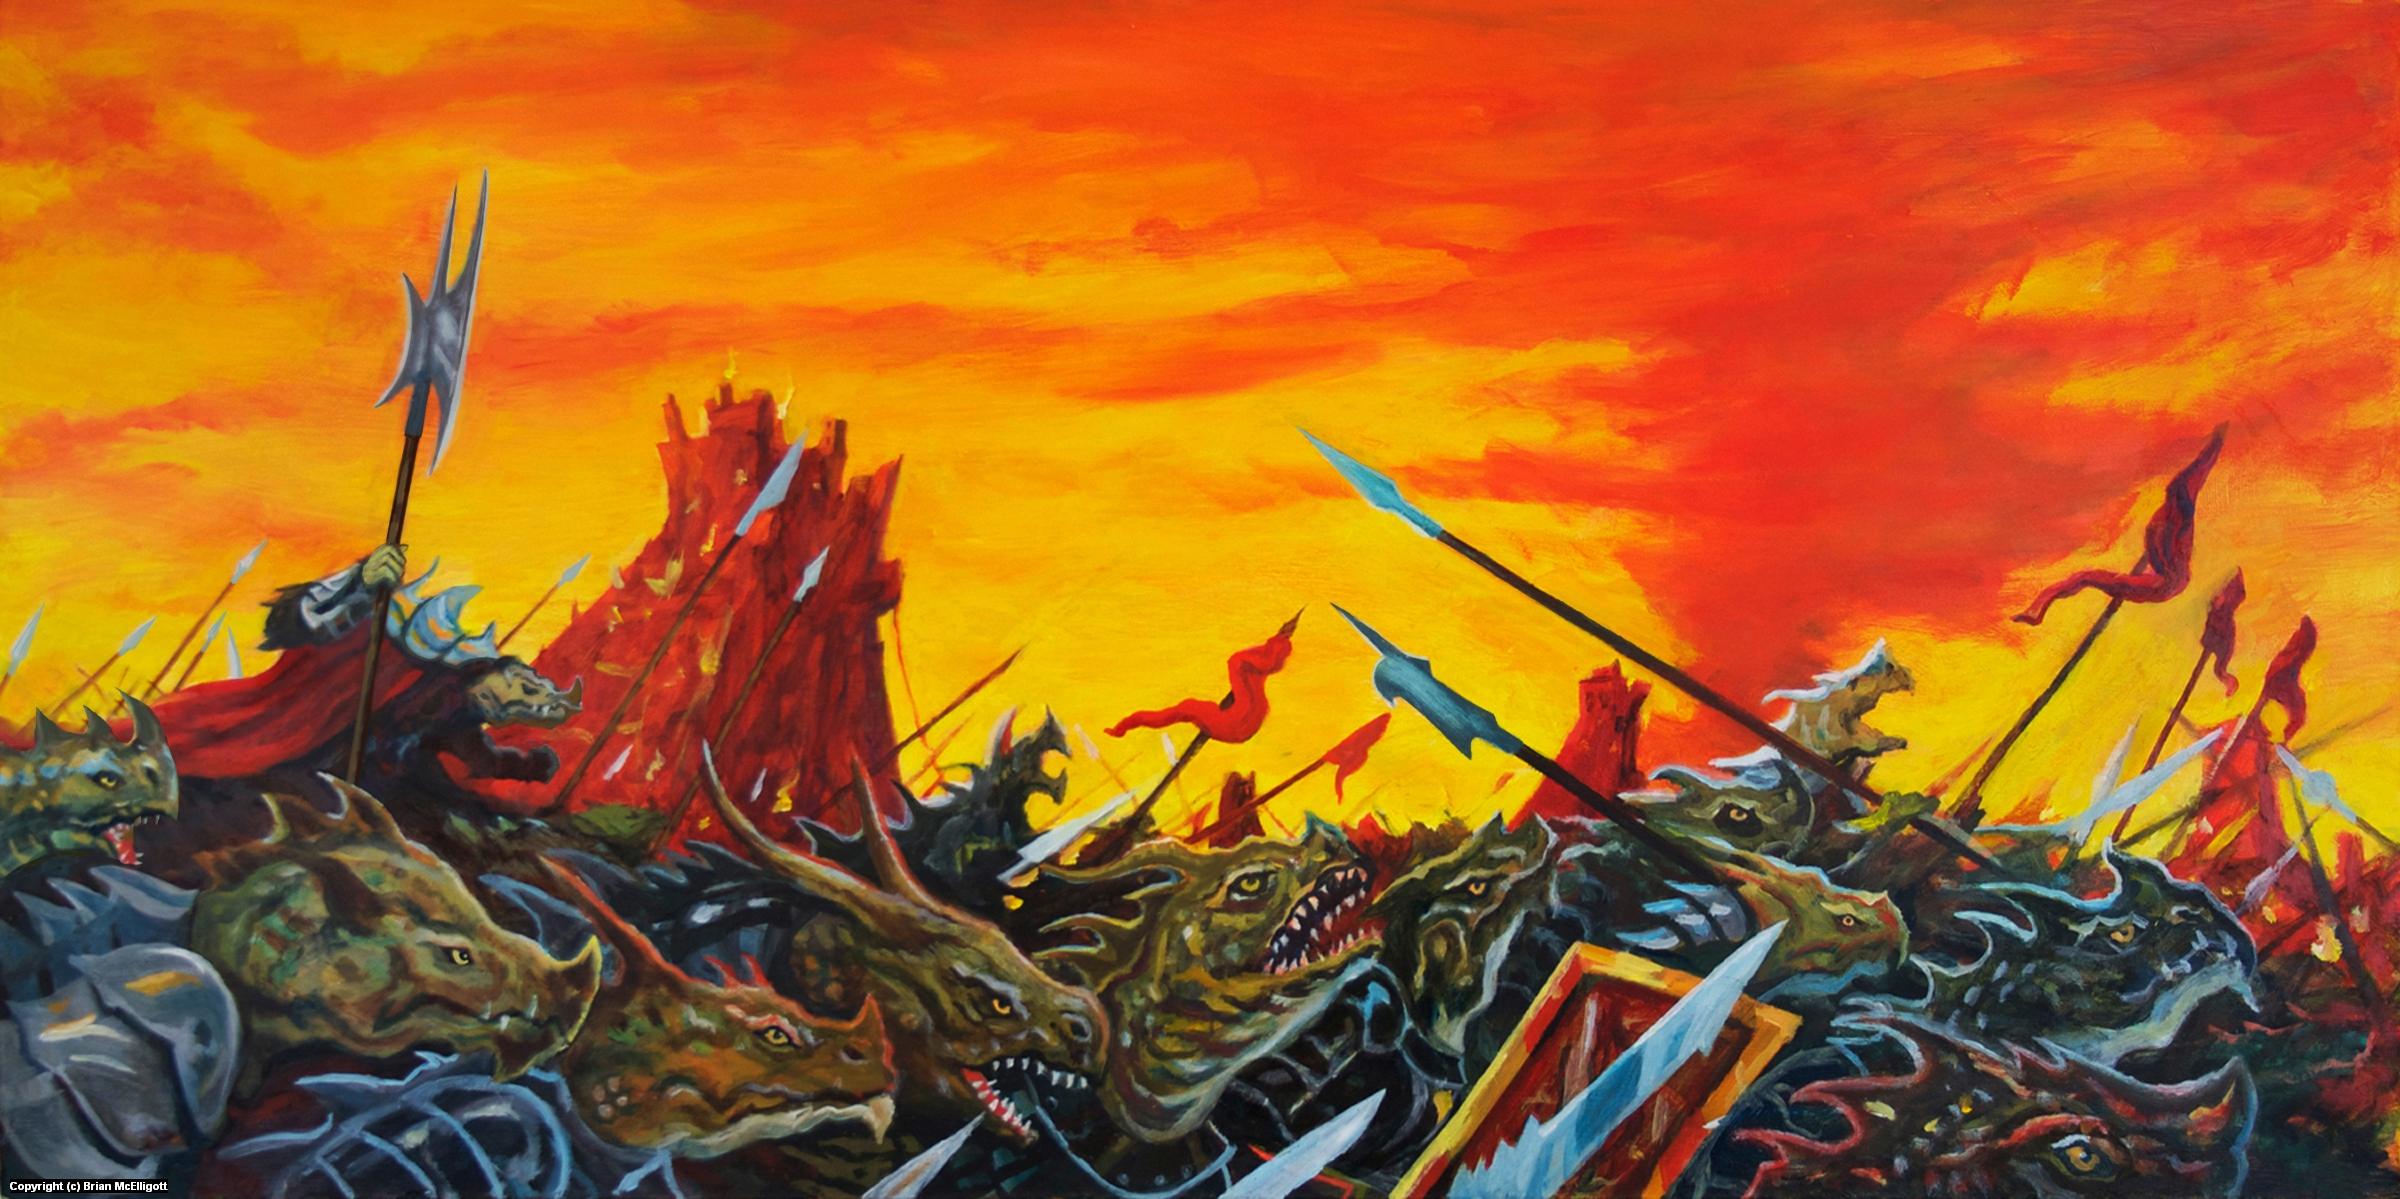 March of the Lizardfolk Artwork by Brian McElligott